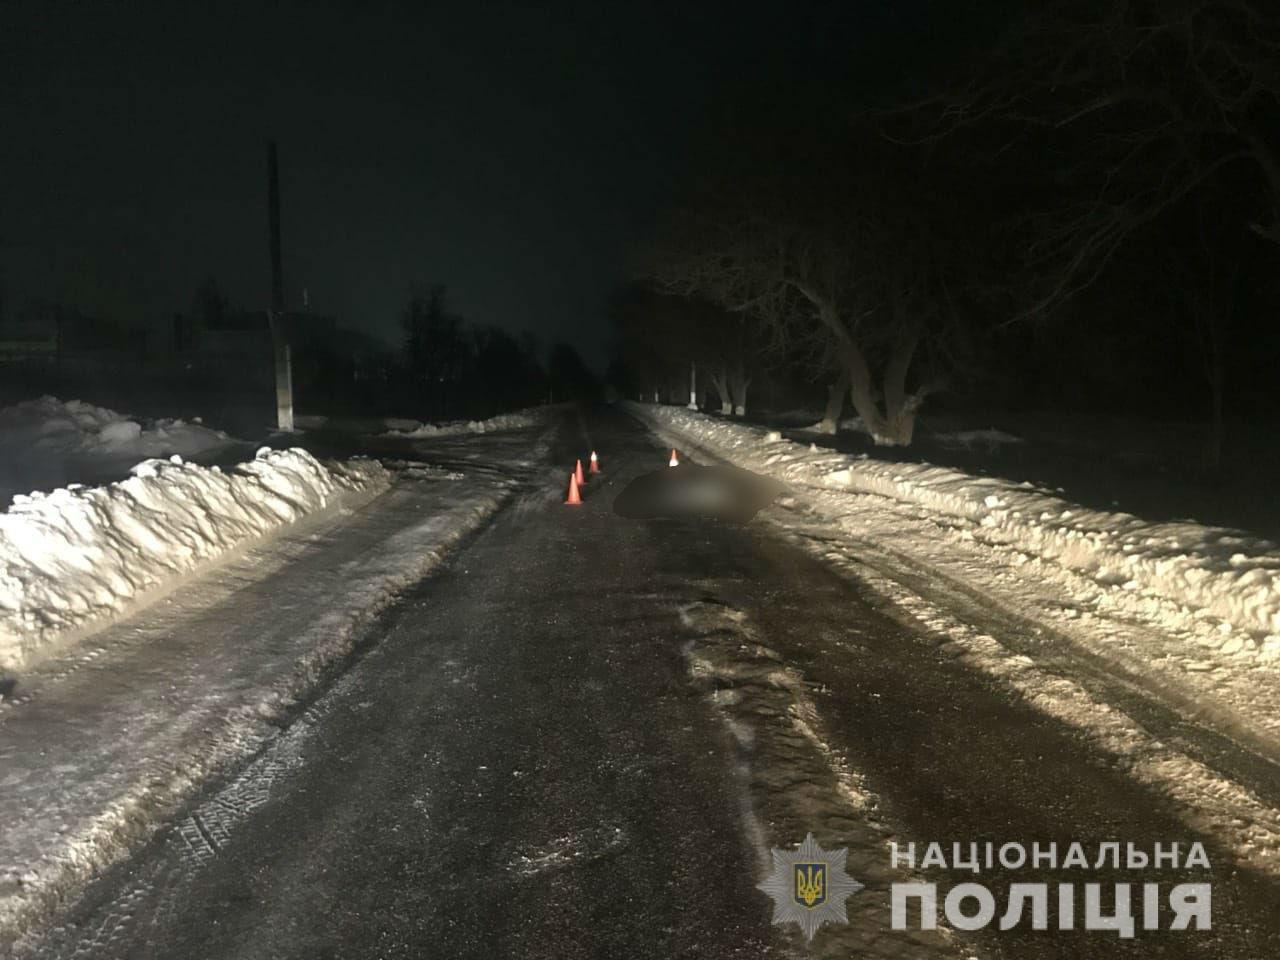 ДТП на Харьковщине. На трассе автомобиль задавил пешехода, - ФОТО, фото-1